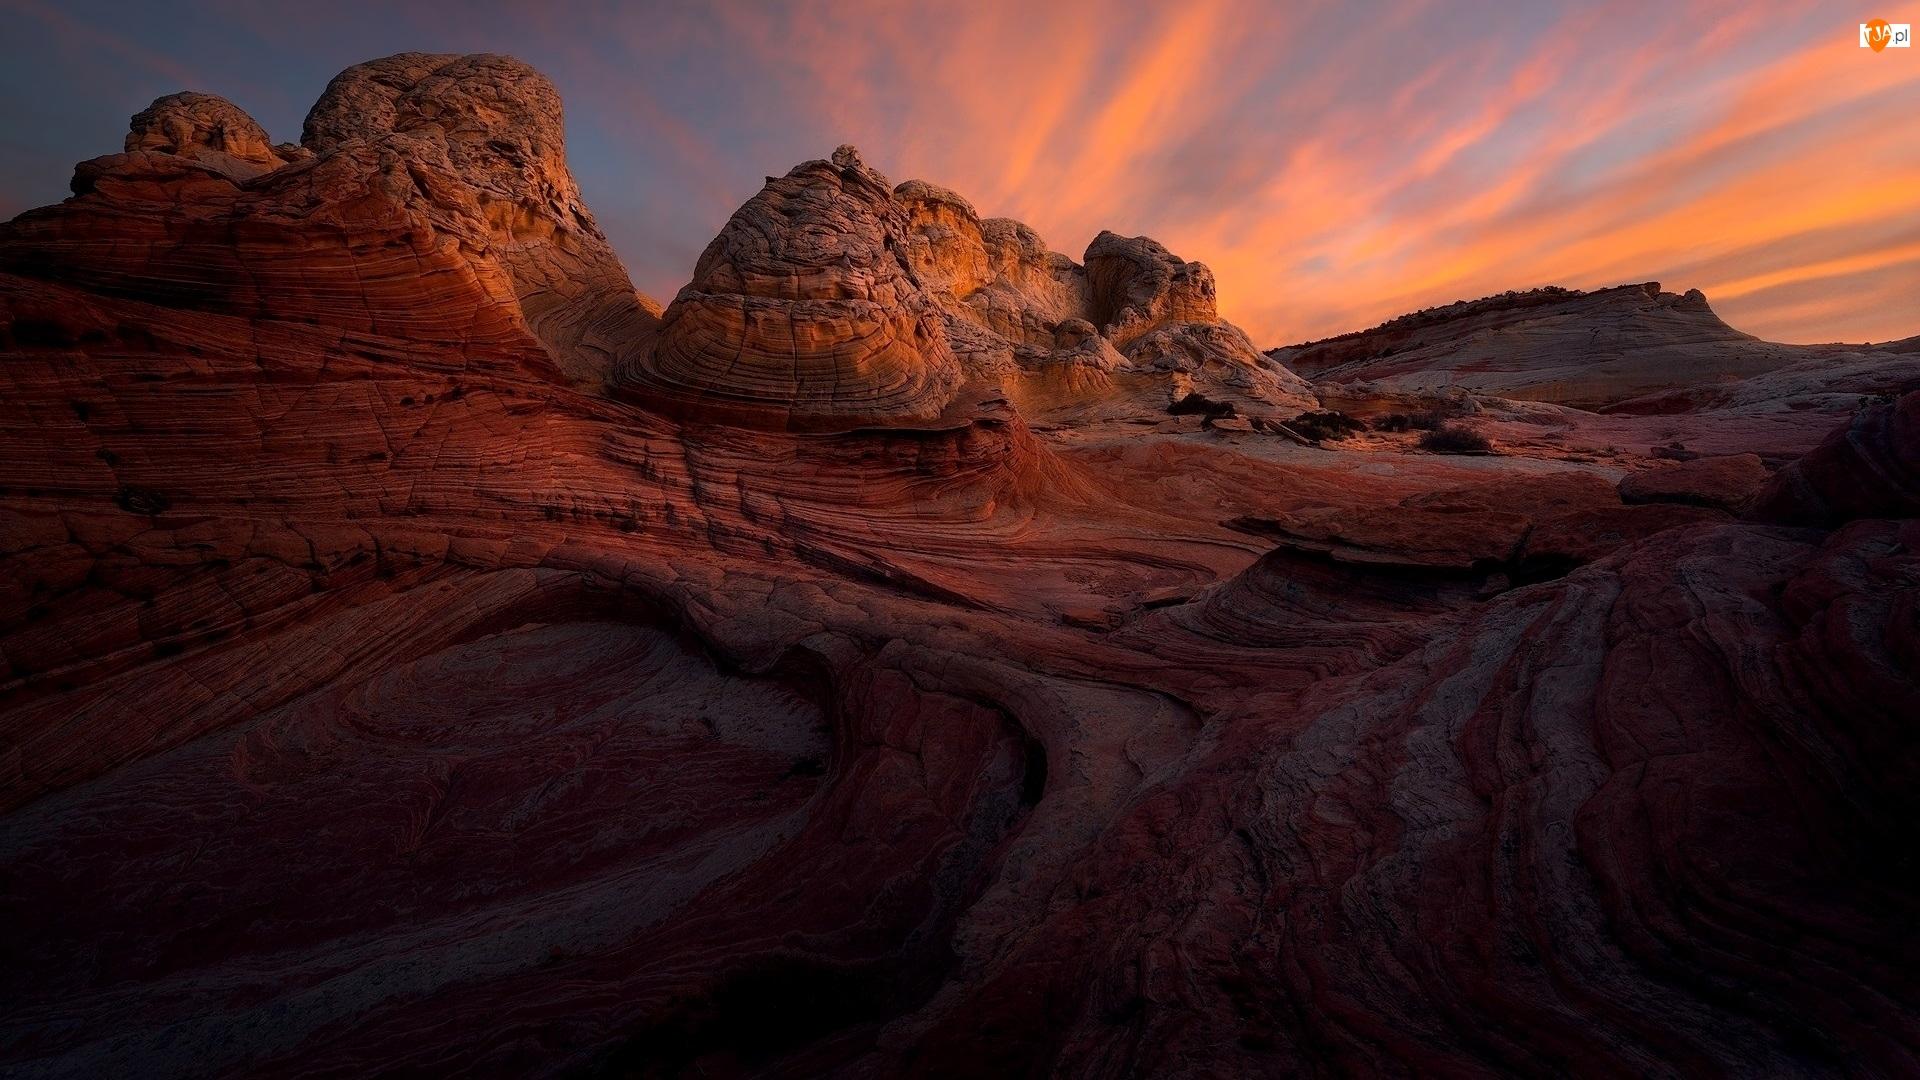 Formacje skalne, White Pocket, Stany Zjednoczone, Skały, Arizona, Pomnik narodowy, Vermilion Cliffs National Monument